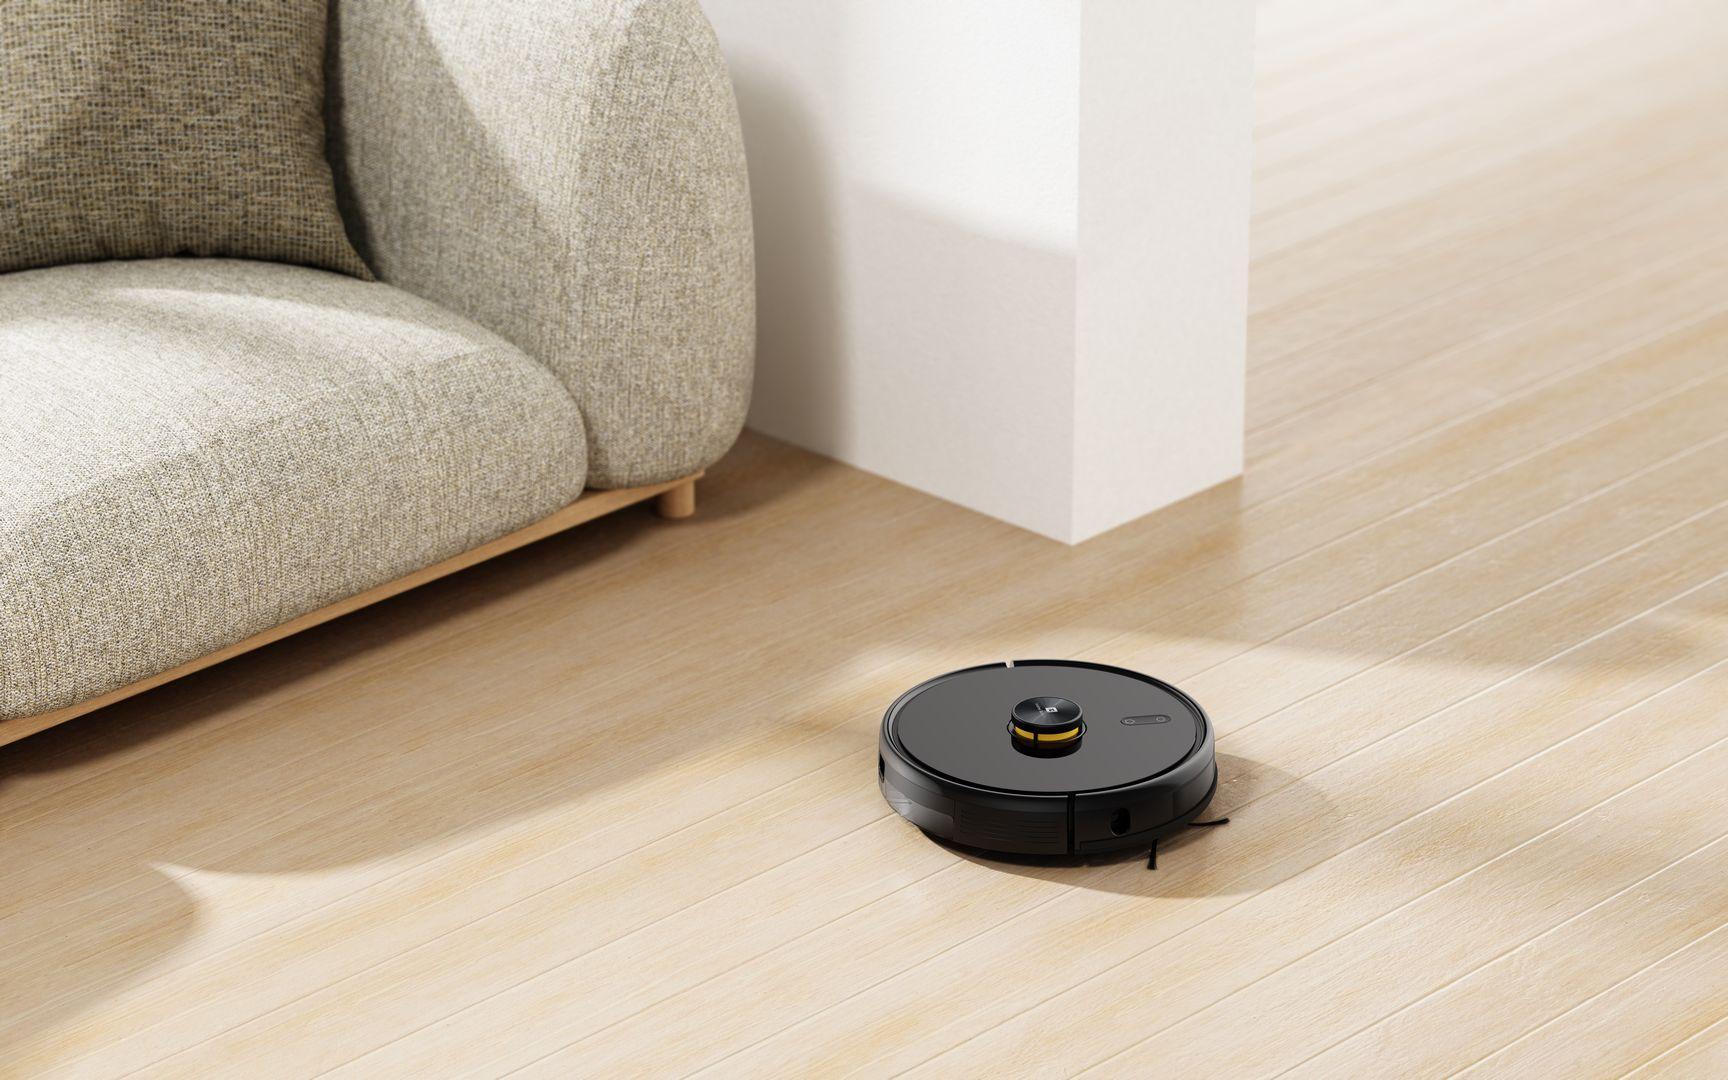 realme TechLife Robot Vacuum fot. realme